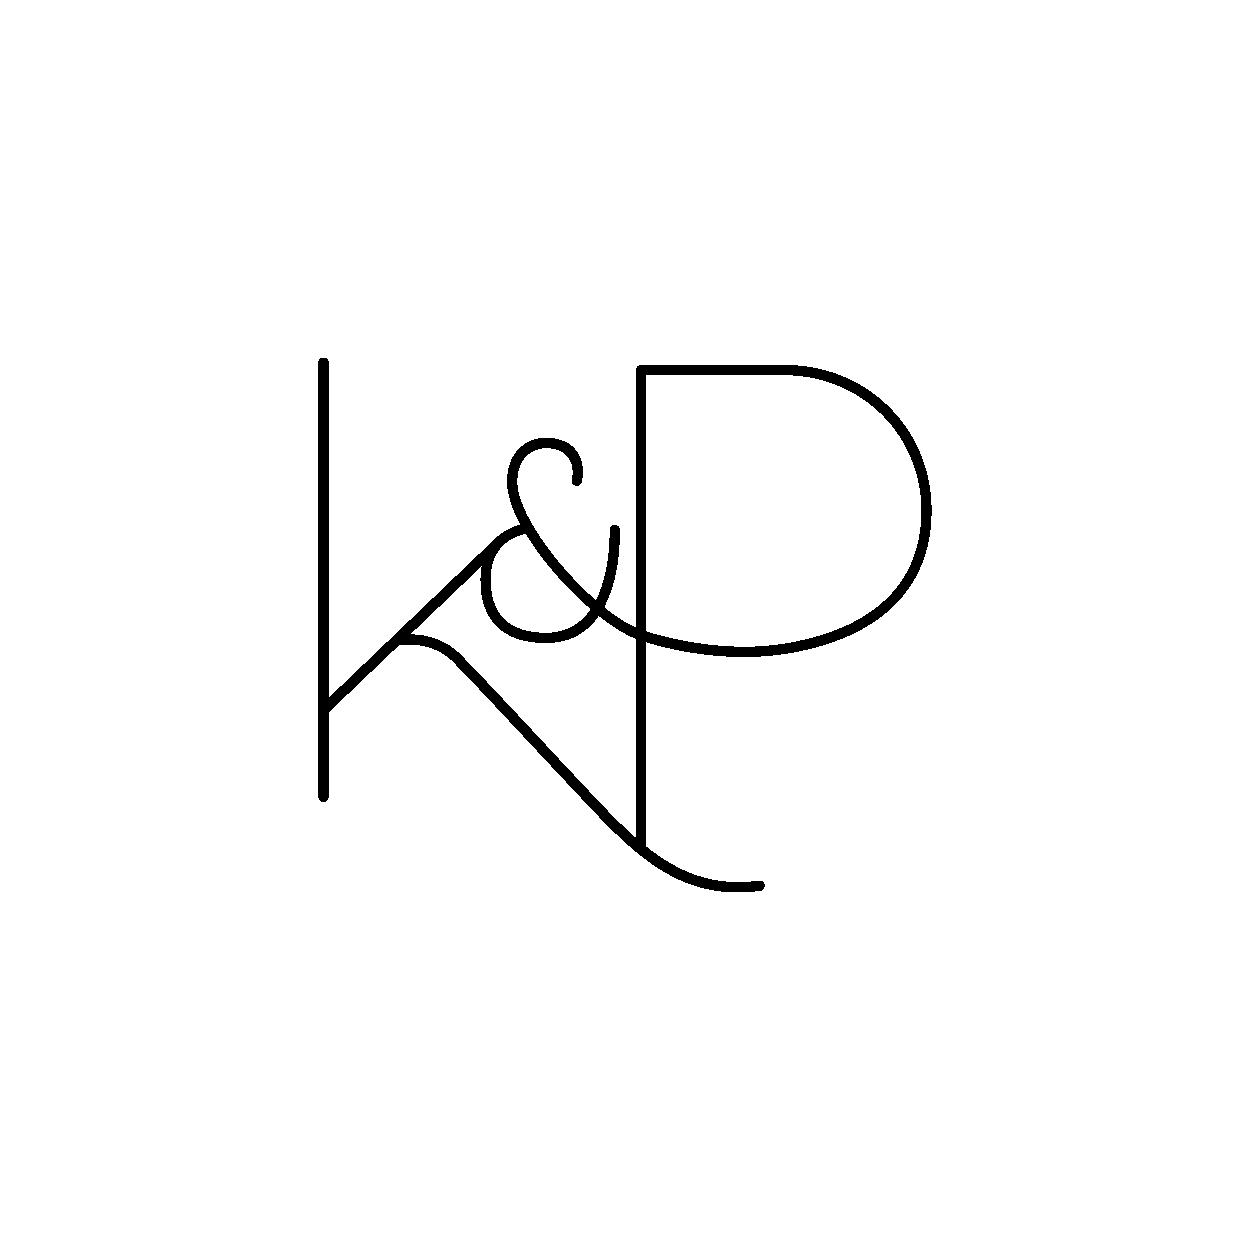 18-kp.png